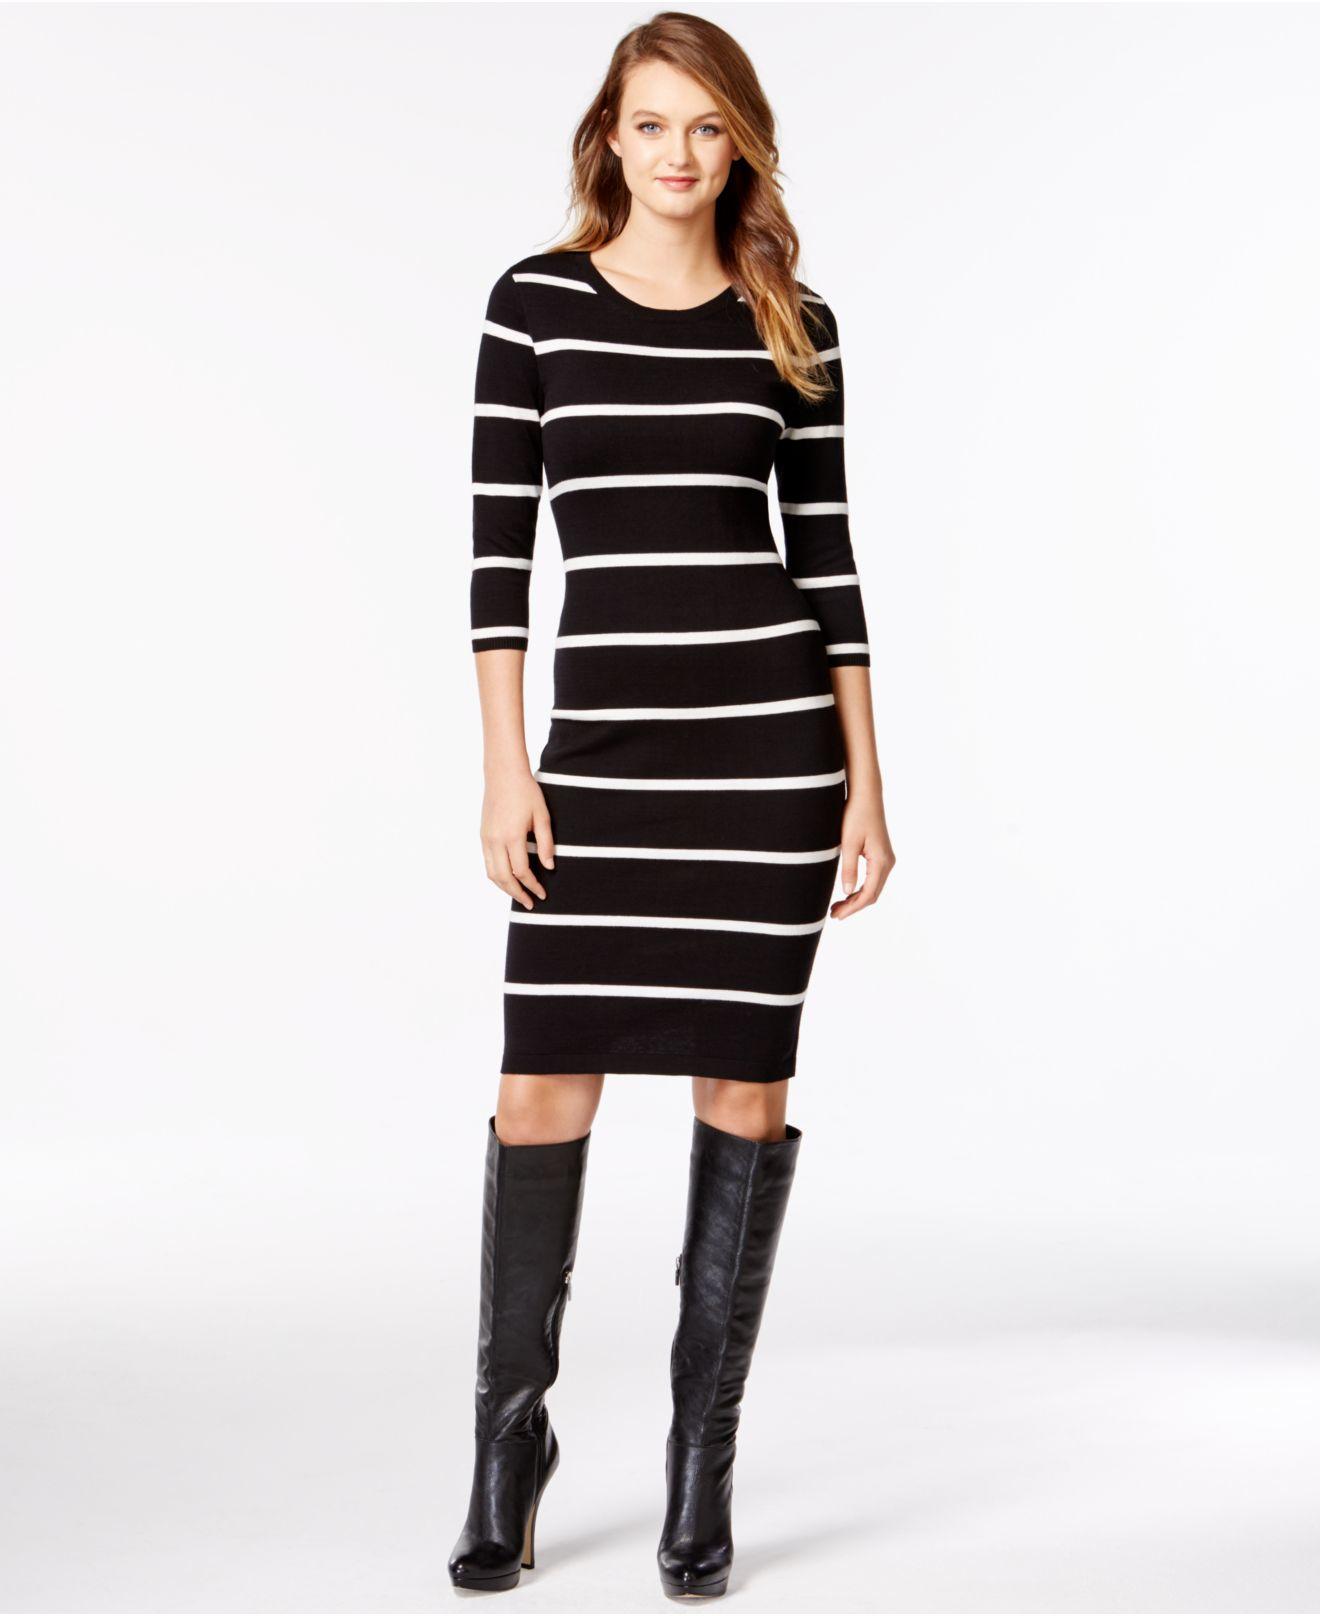 429d781ede4f Lyst - Kensie Striped Bodycon Sweater Dress in Black